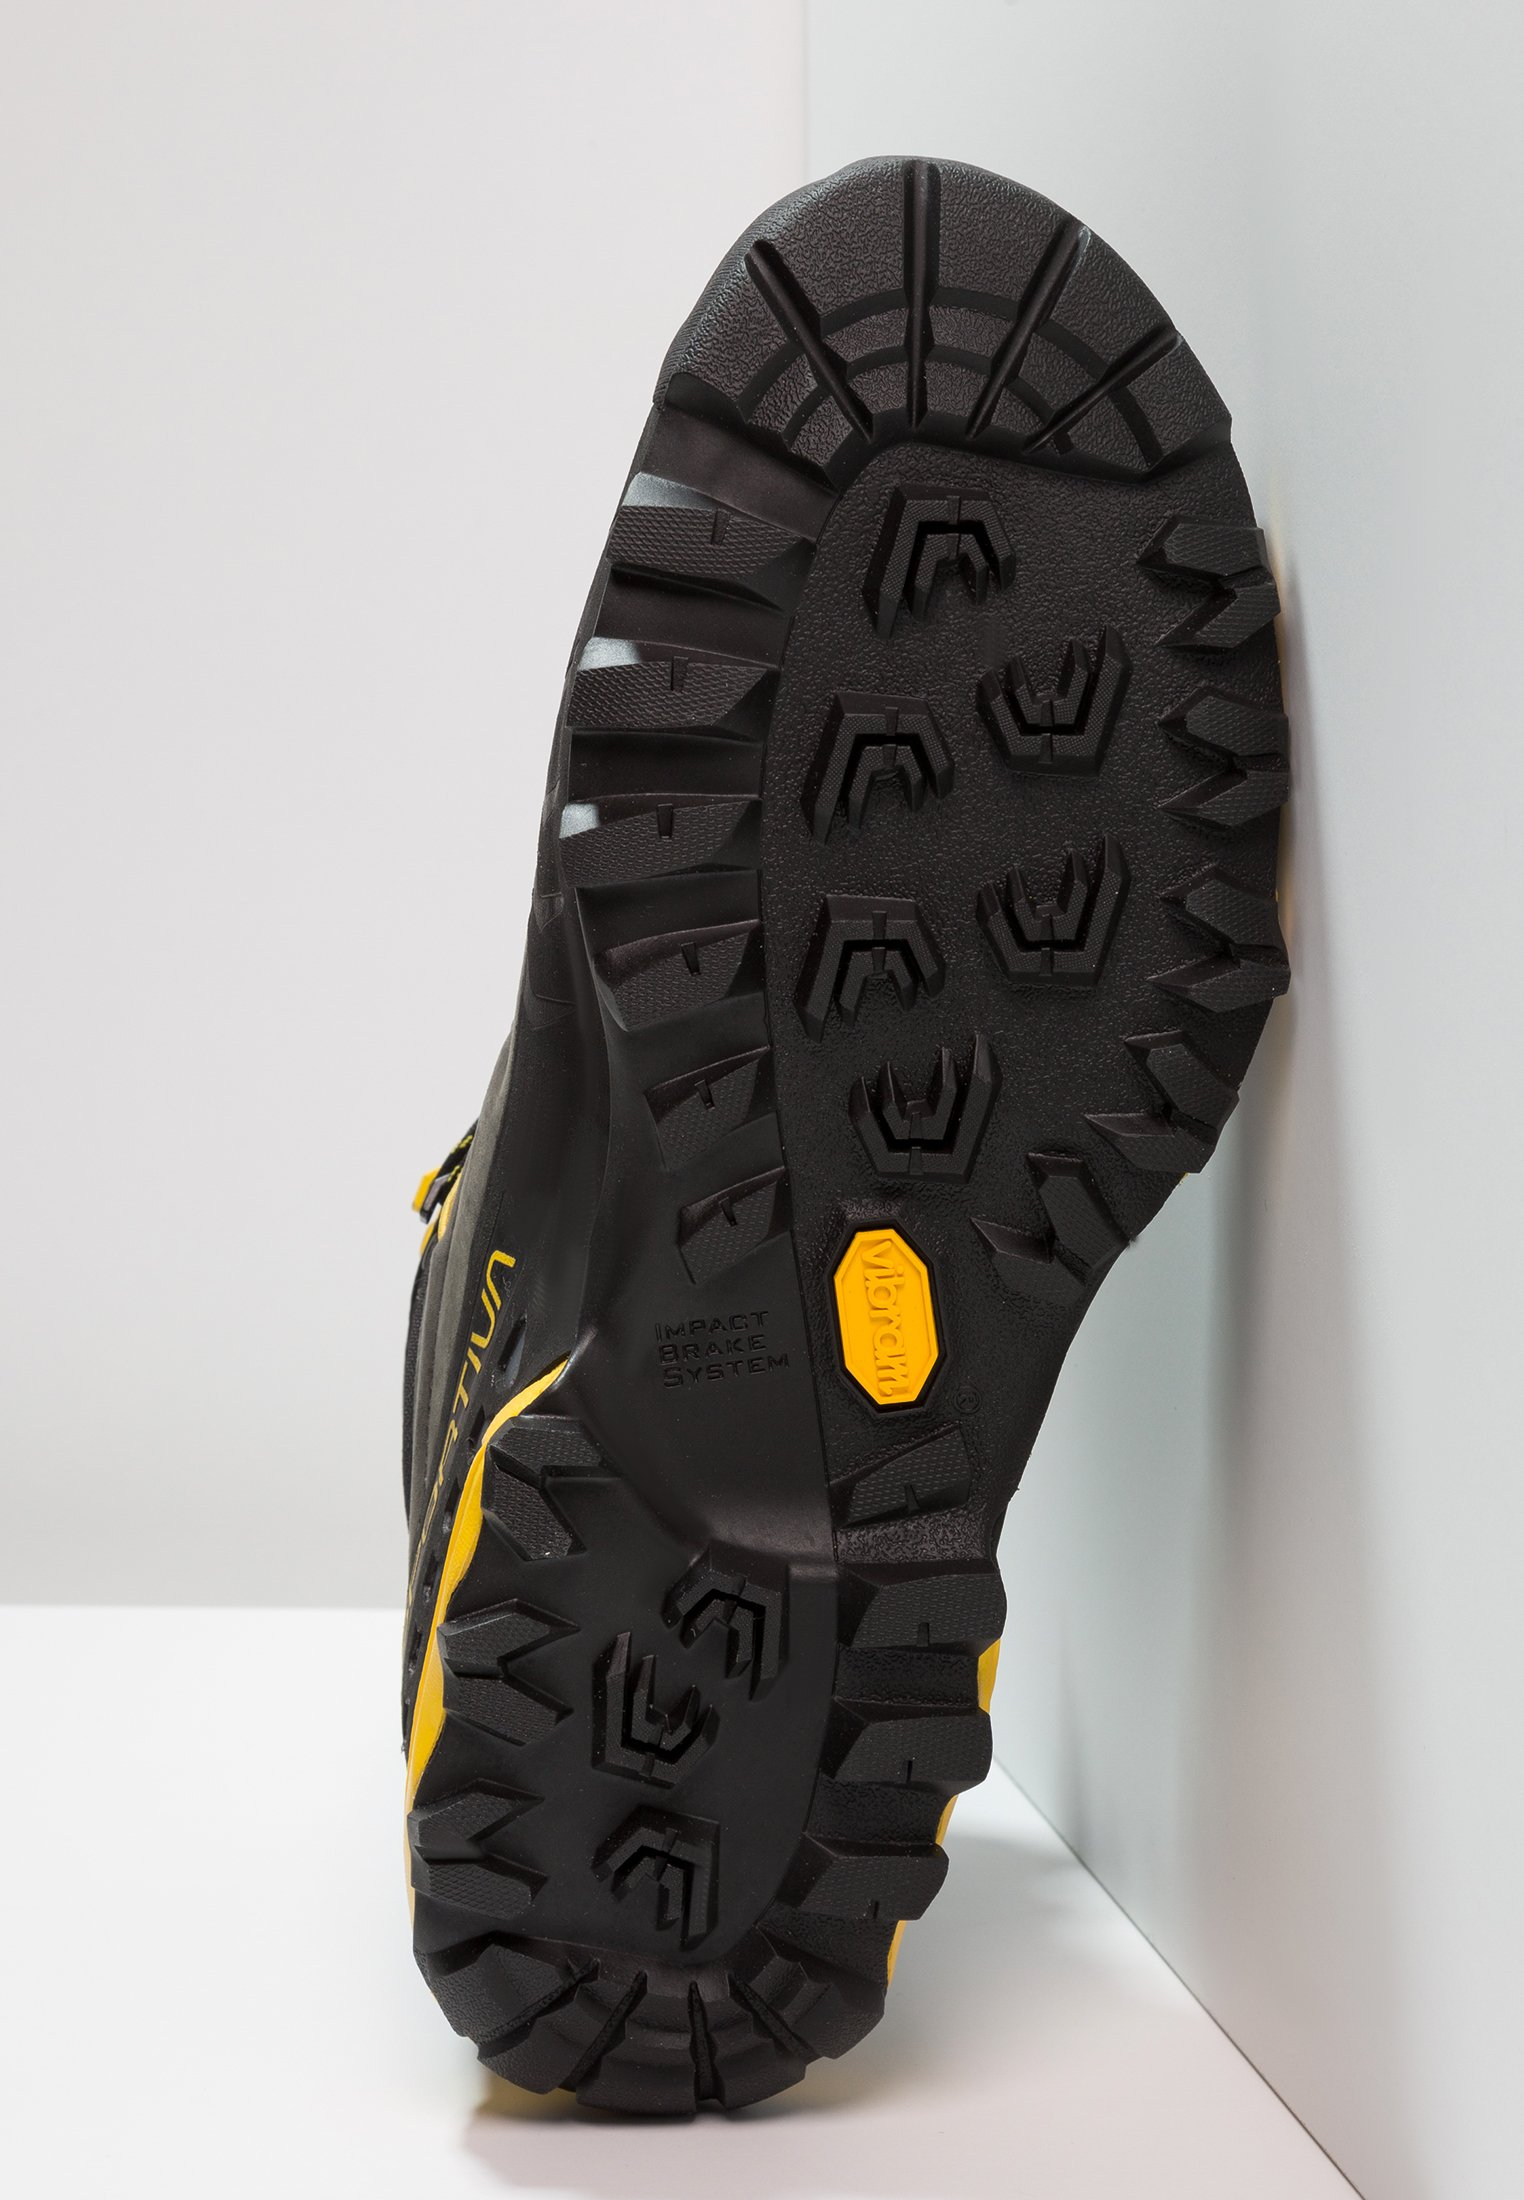 GtxBottines Carbon Sportiva Tx5 yellow La Randonnée De QECBorWxed